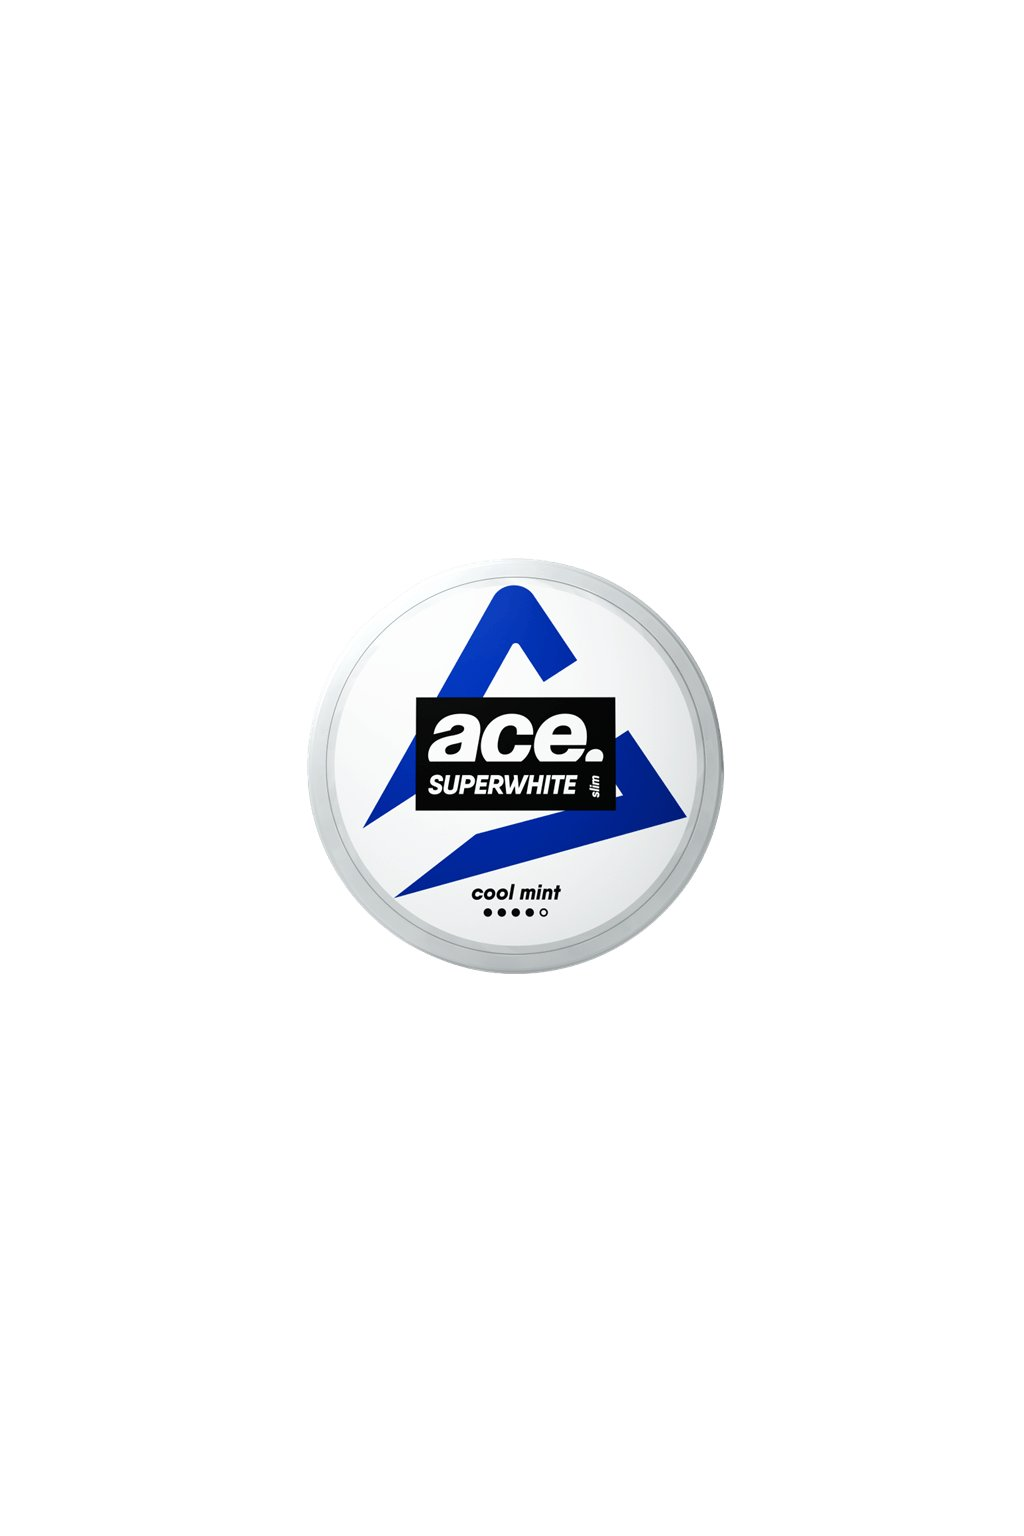 ace cool mint strong nikotinové sáčky nordiction